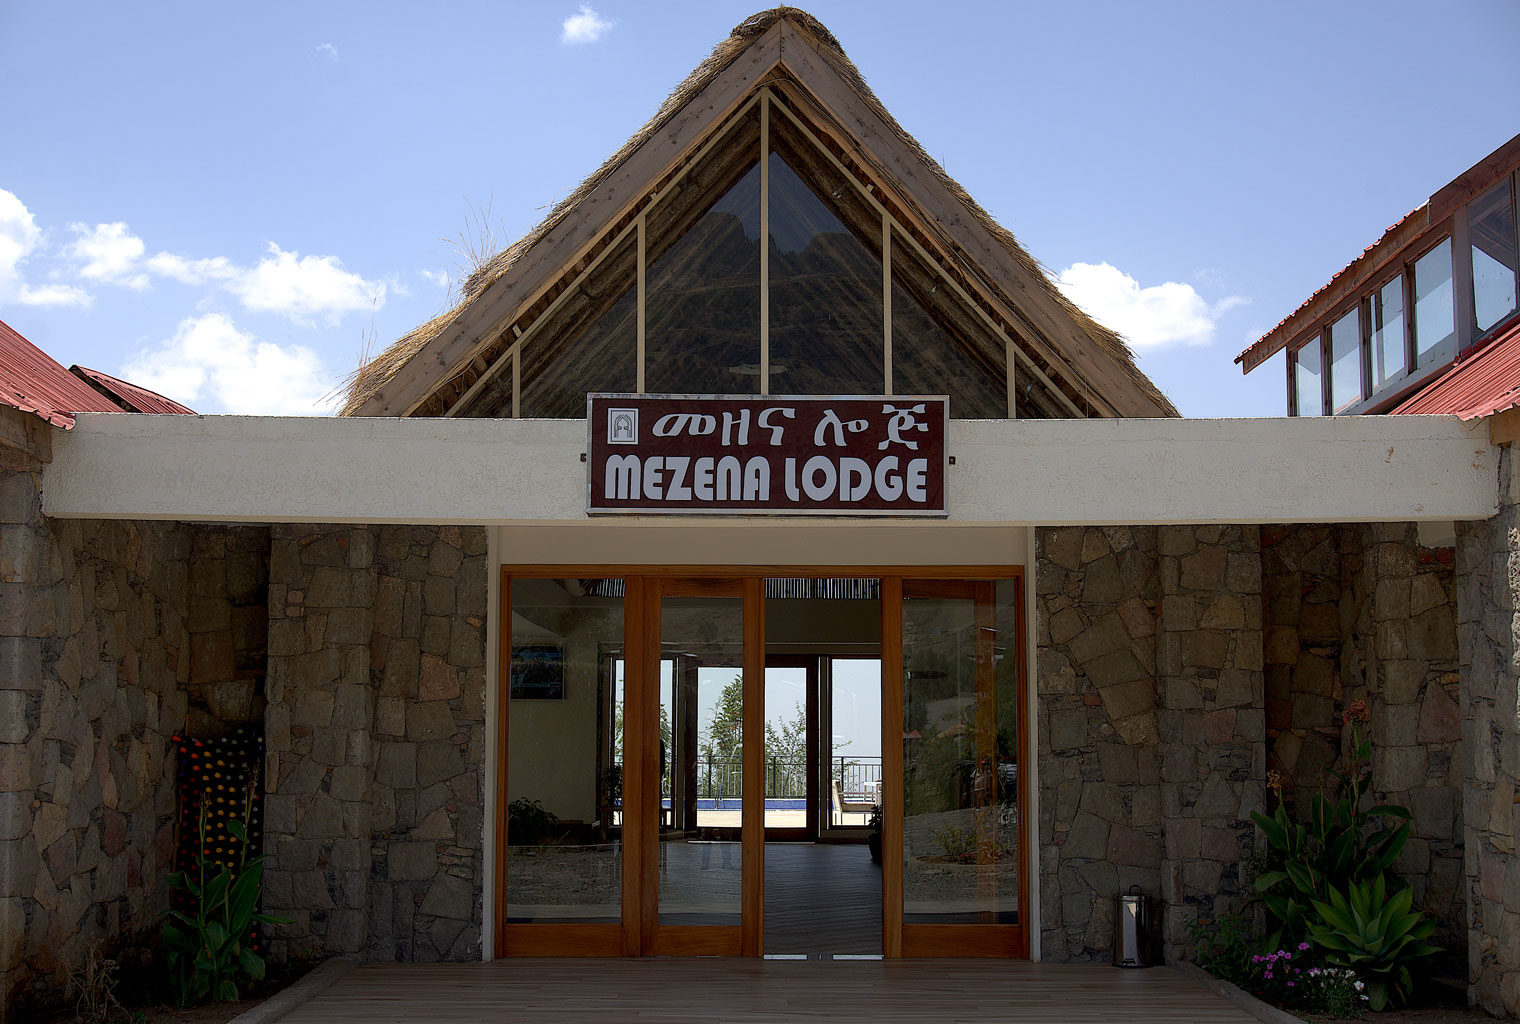 Mezena-Lodge-Lalibela-Ethiopia-Entrance